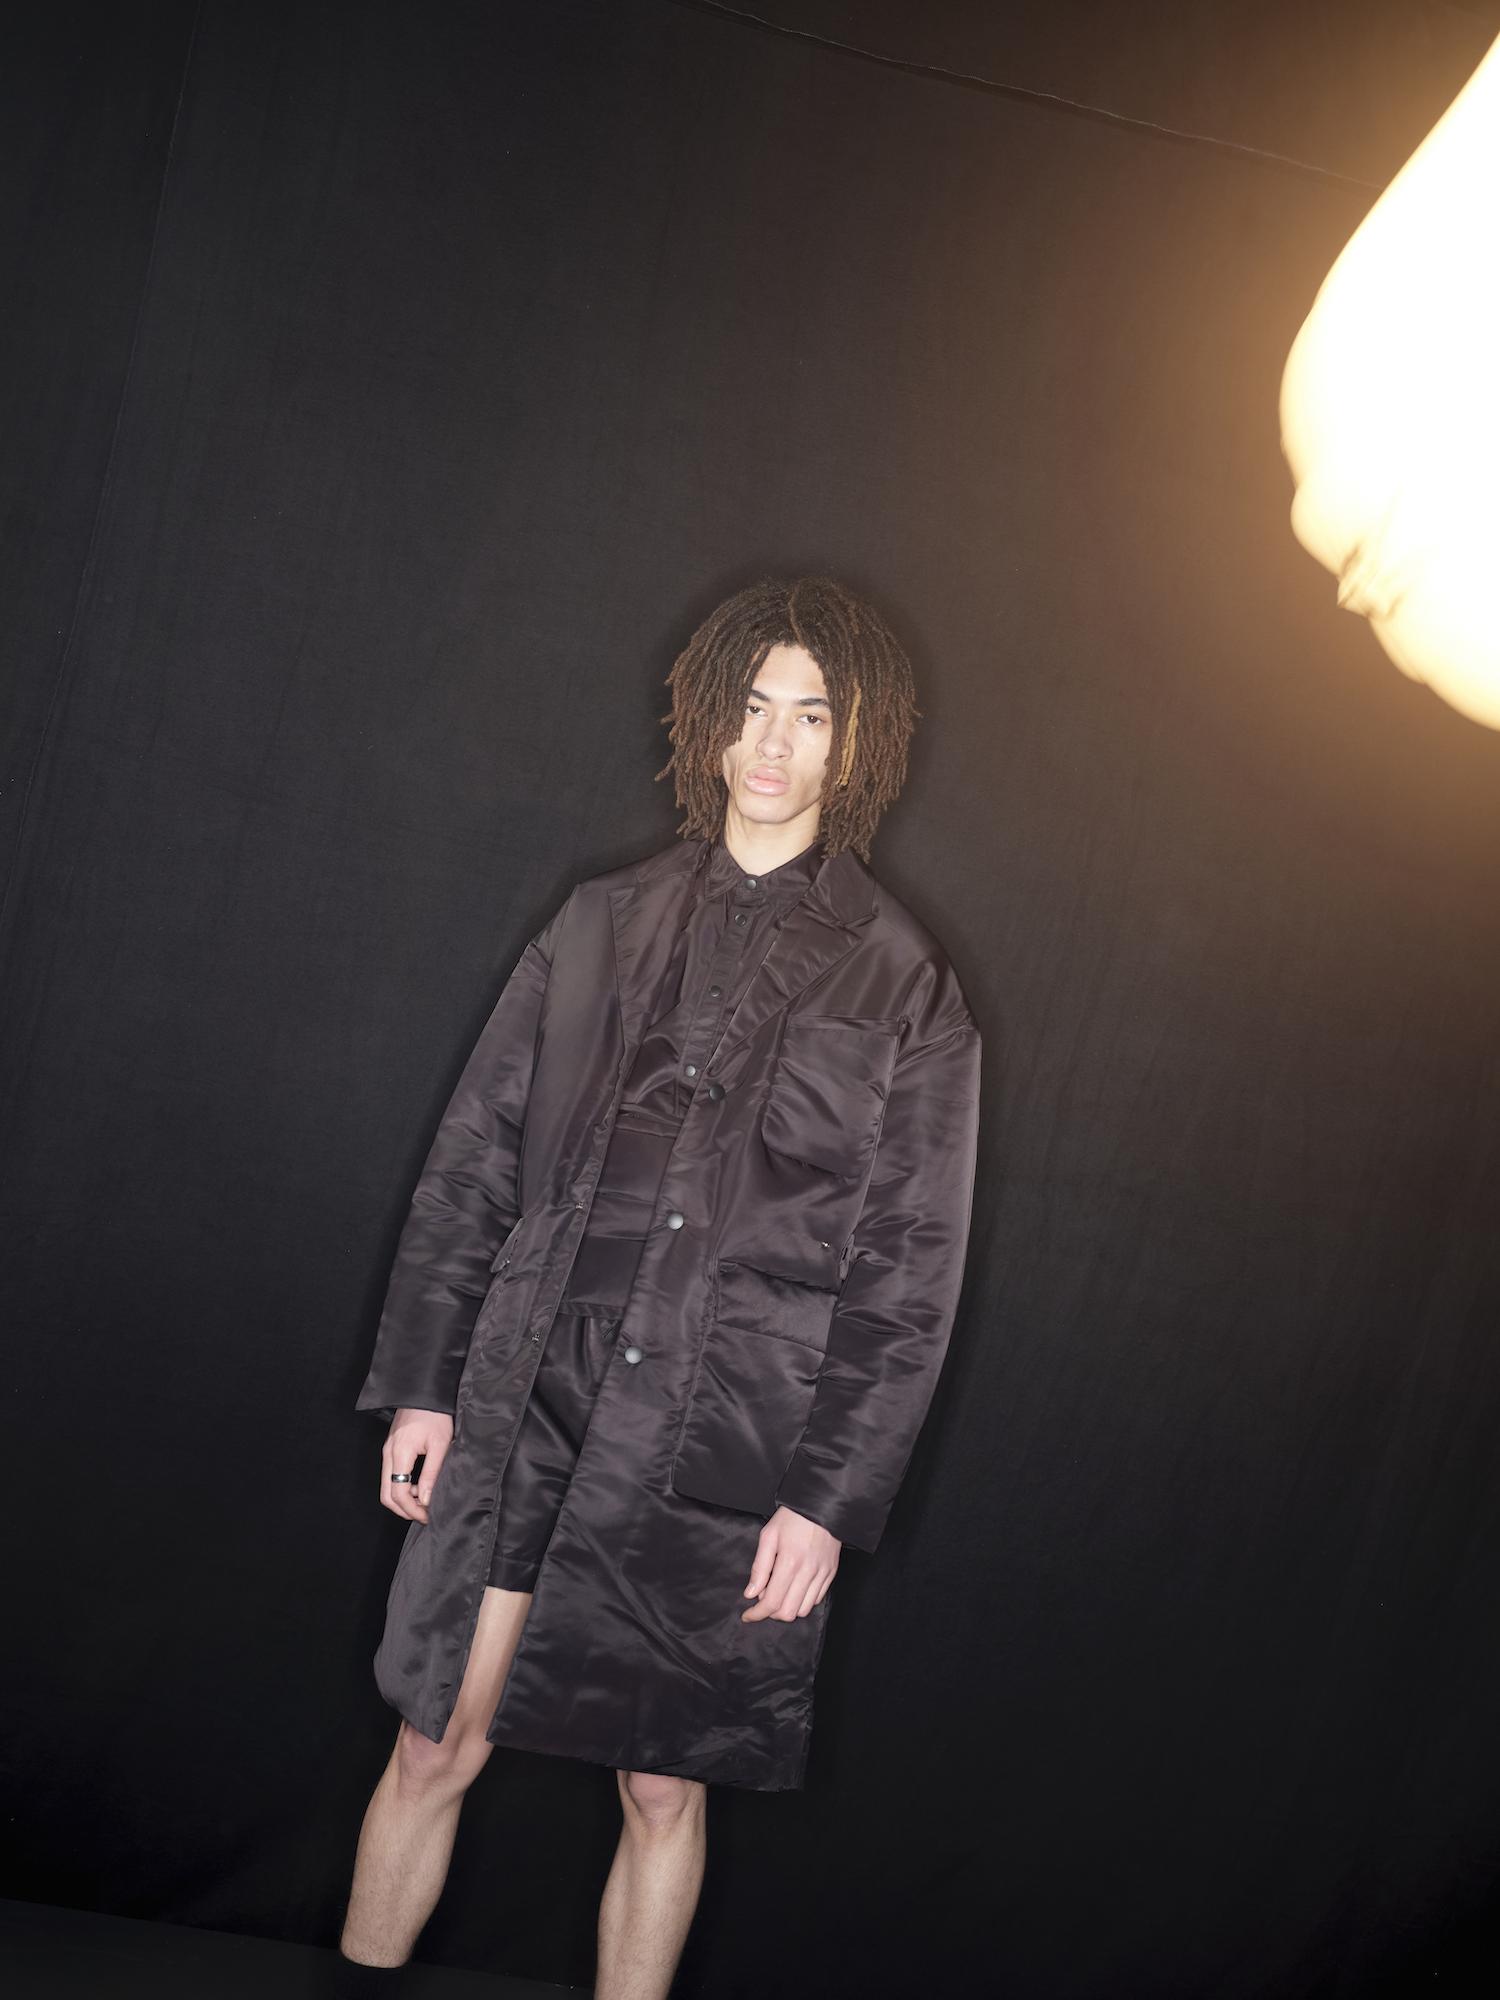 Onitsuka Tiger Autumn _ Winter 2021 collection_Milan Fashion Show_07.jpg